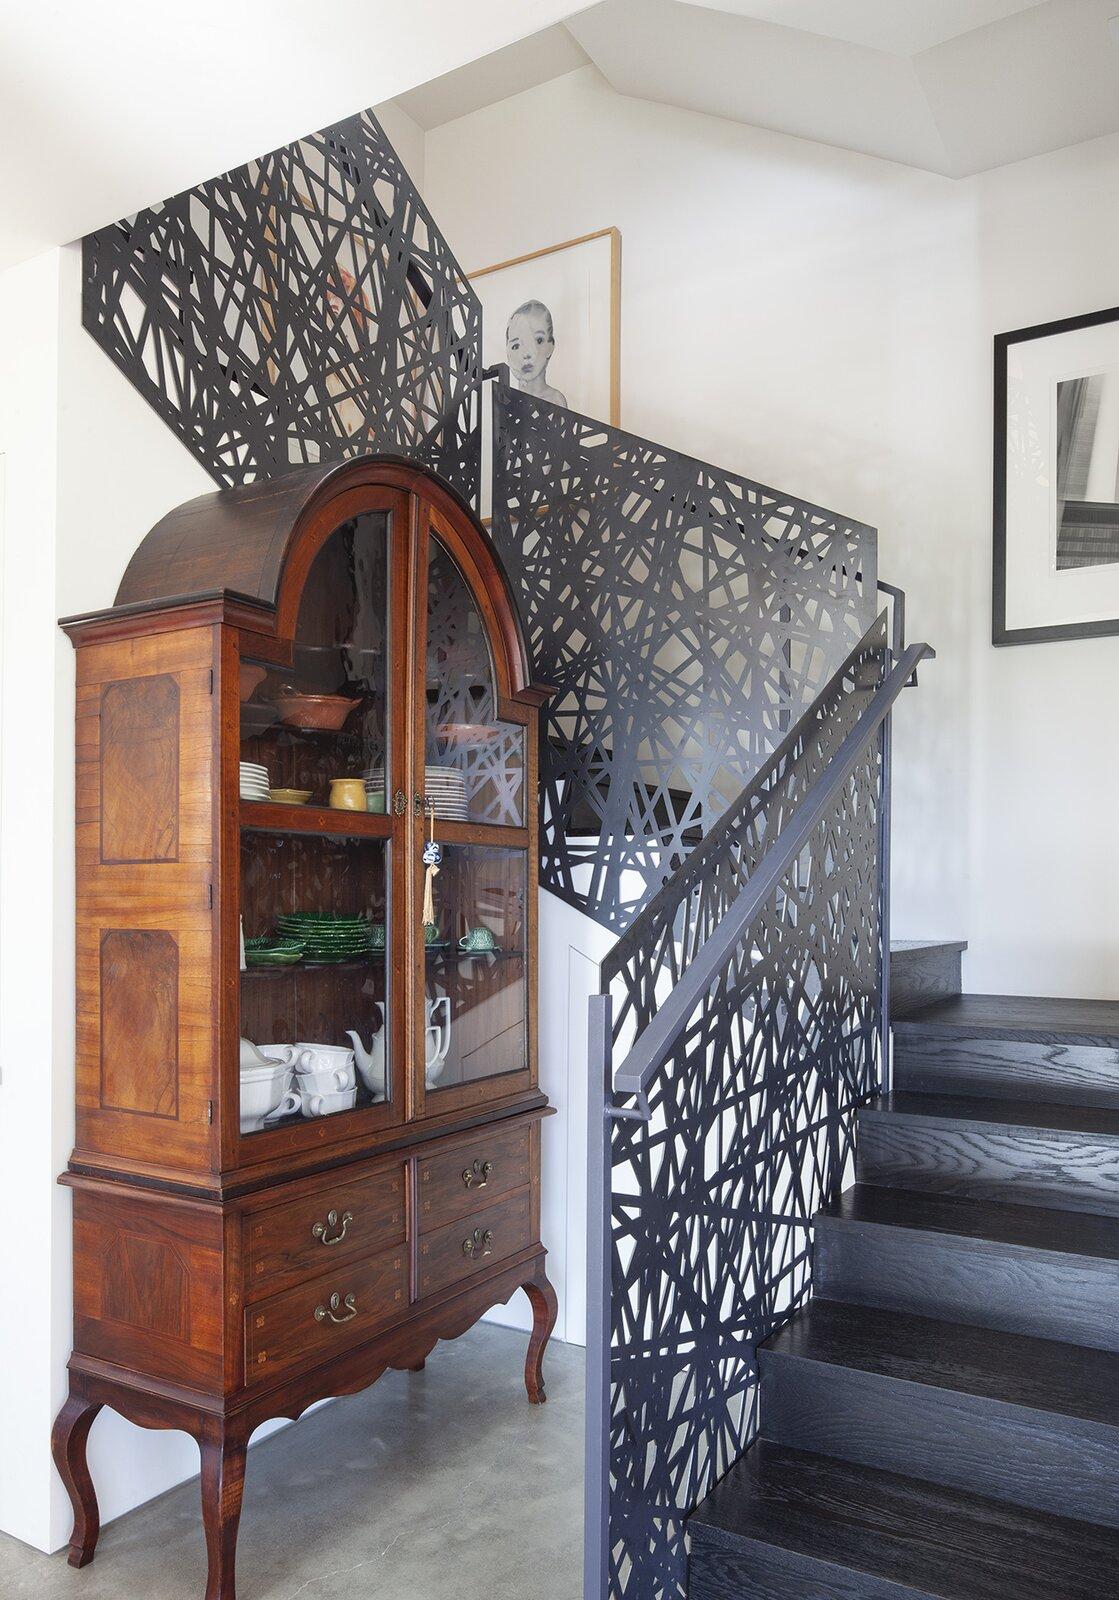 Fisher/Prebor Residence staircase